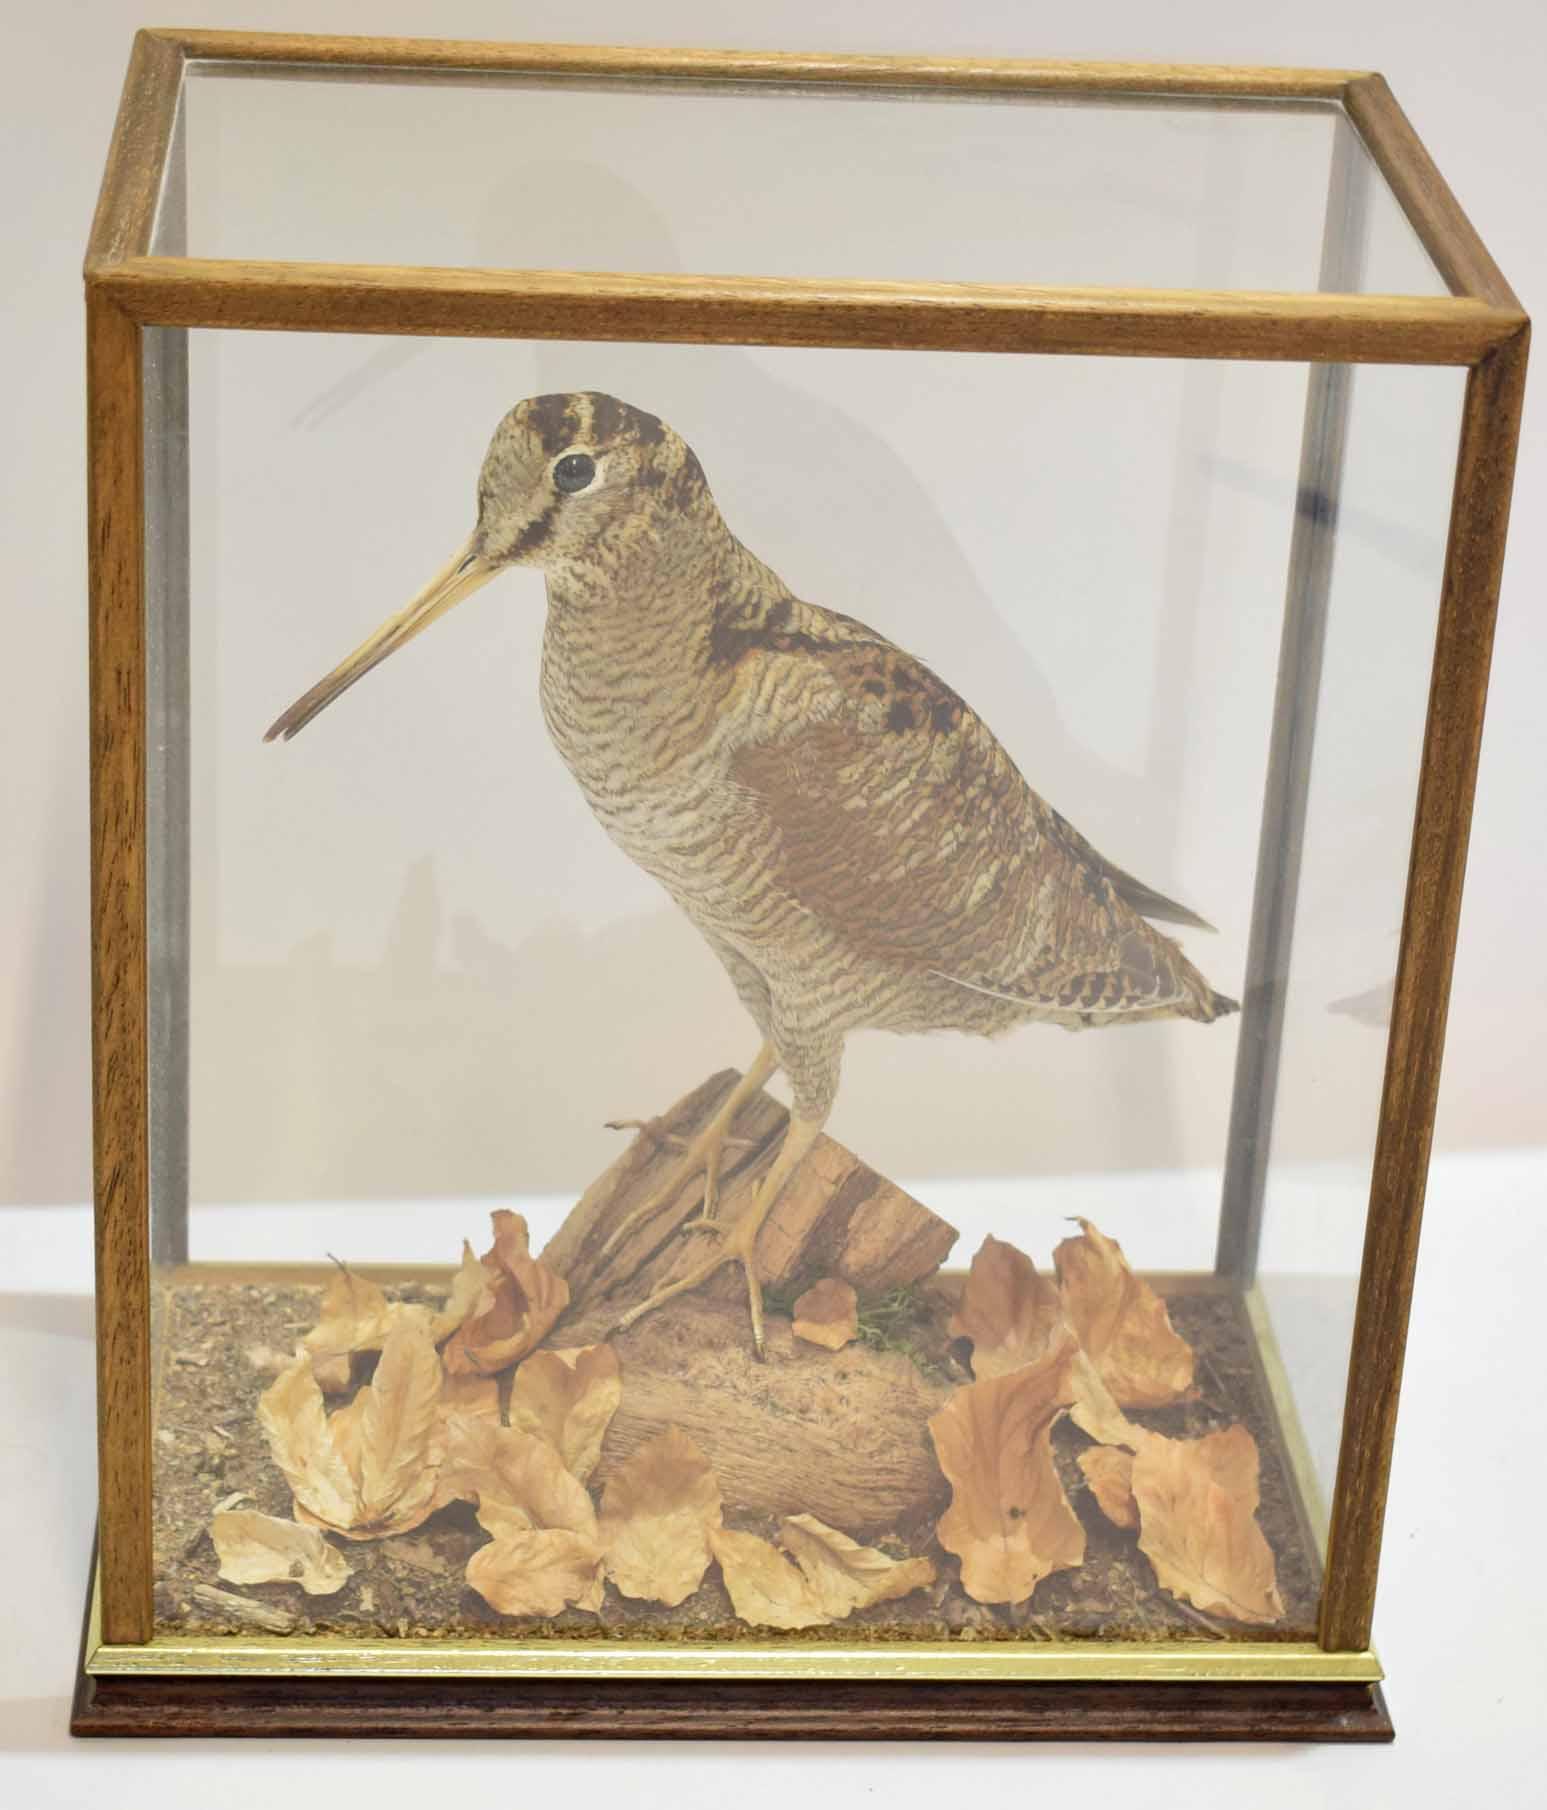 Lot 483 - Taxidermy woodcock in a glazed case, 29cm wide